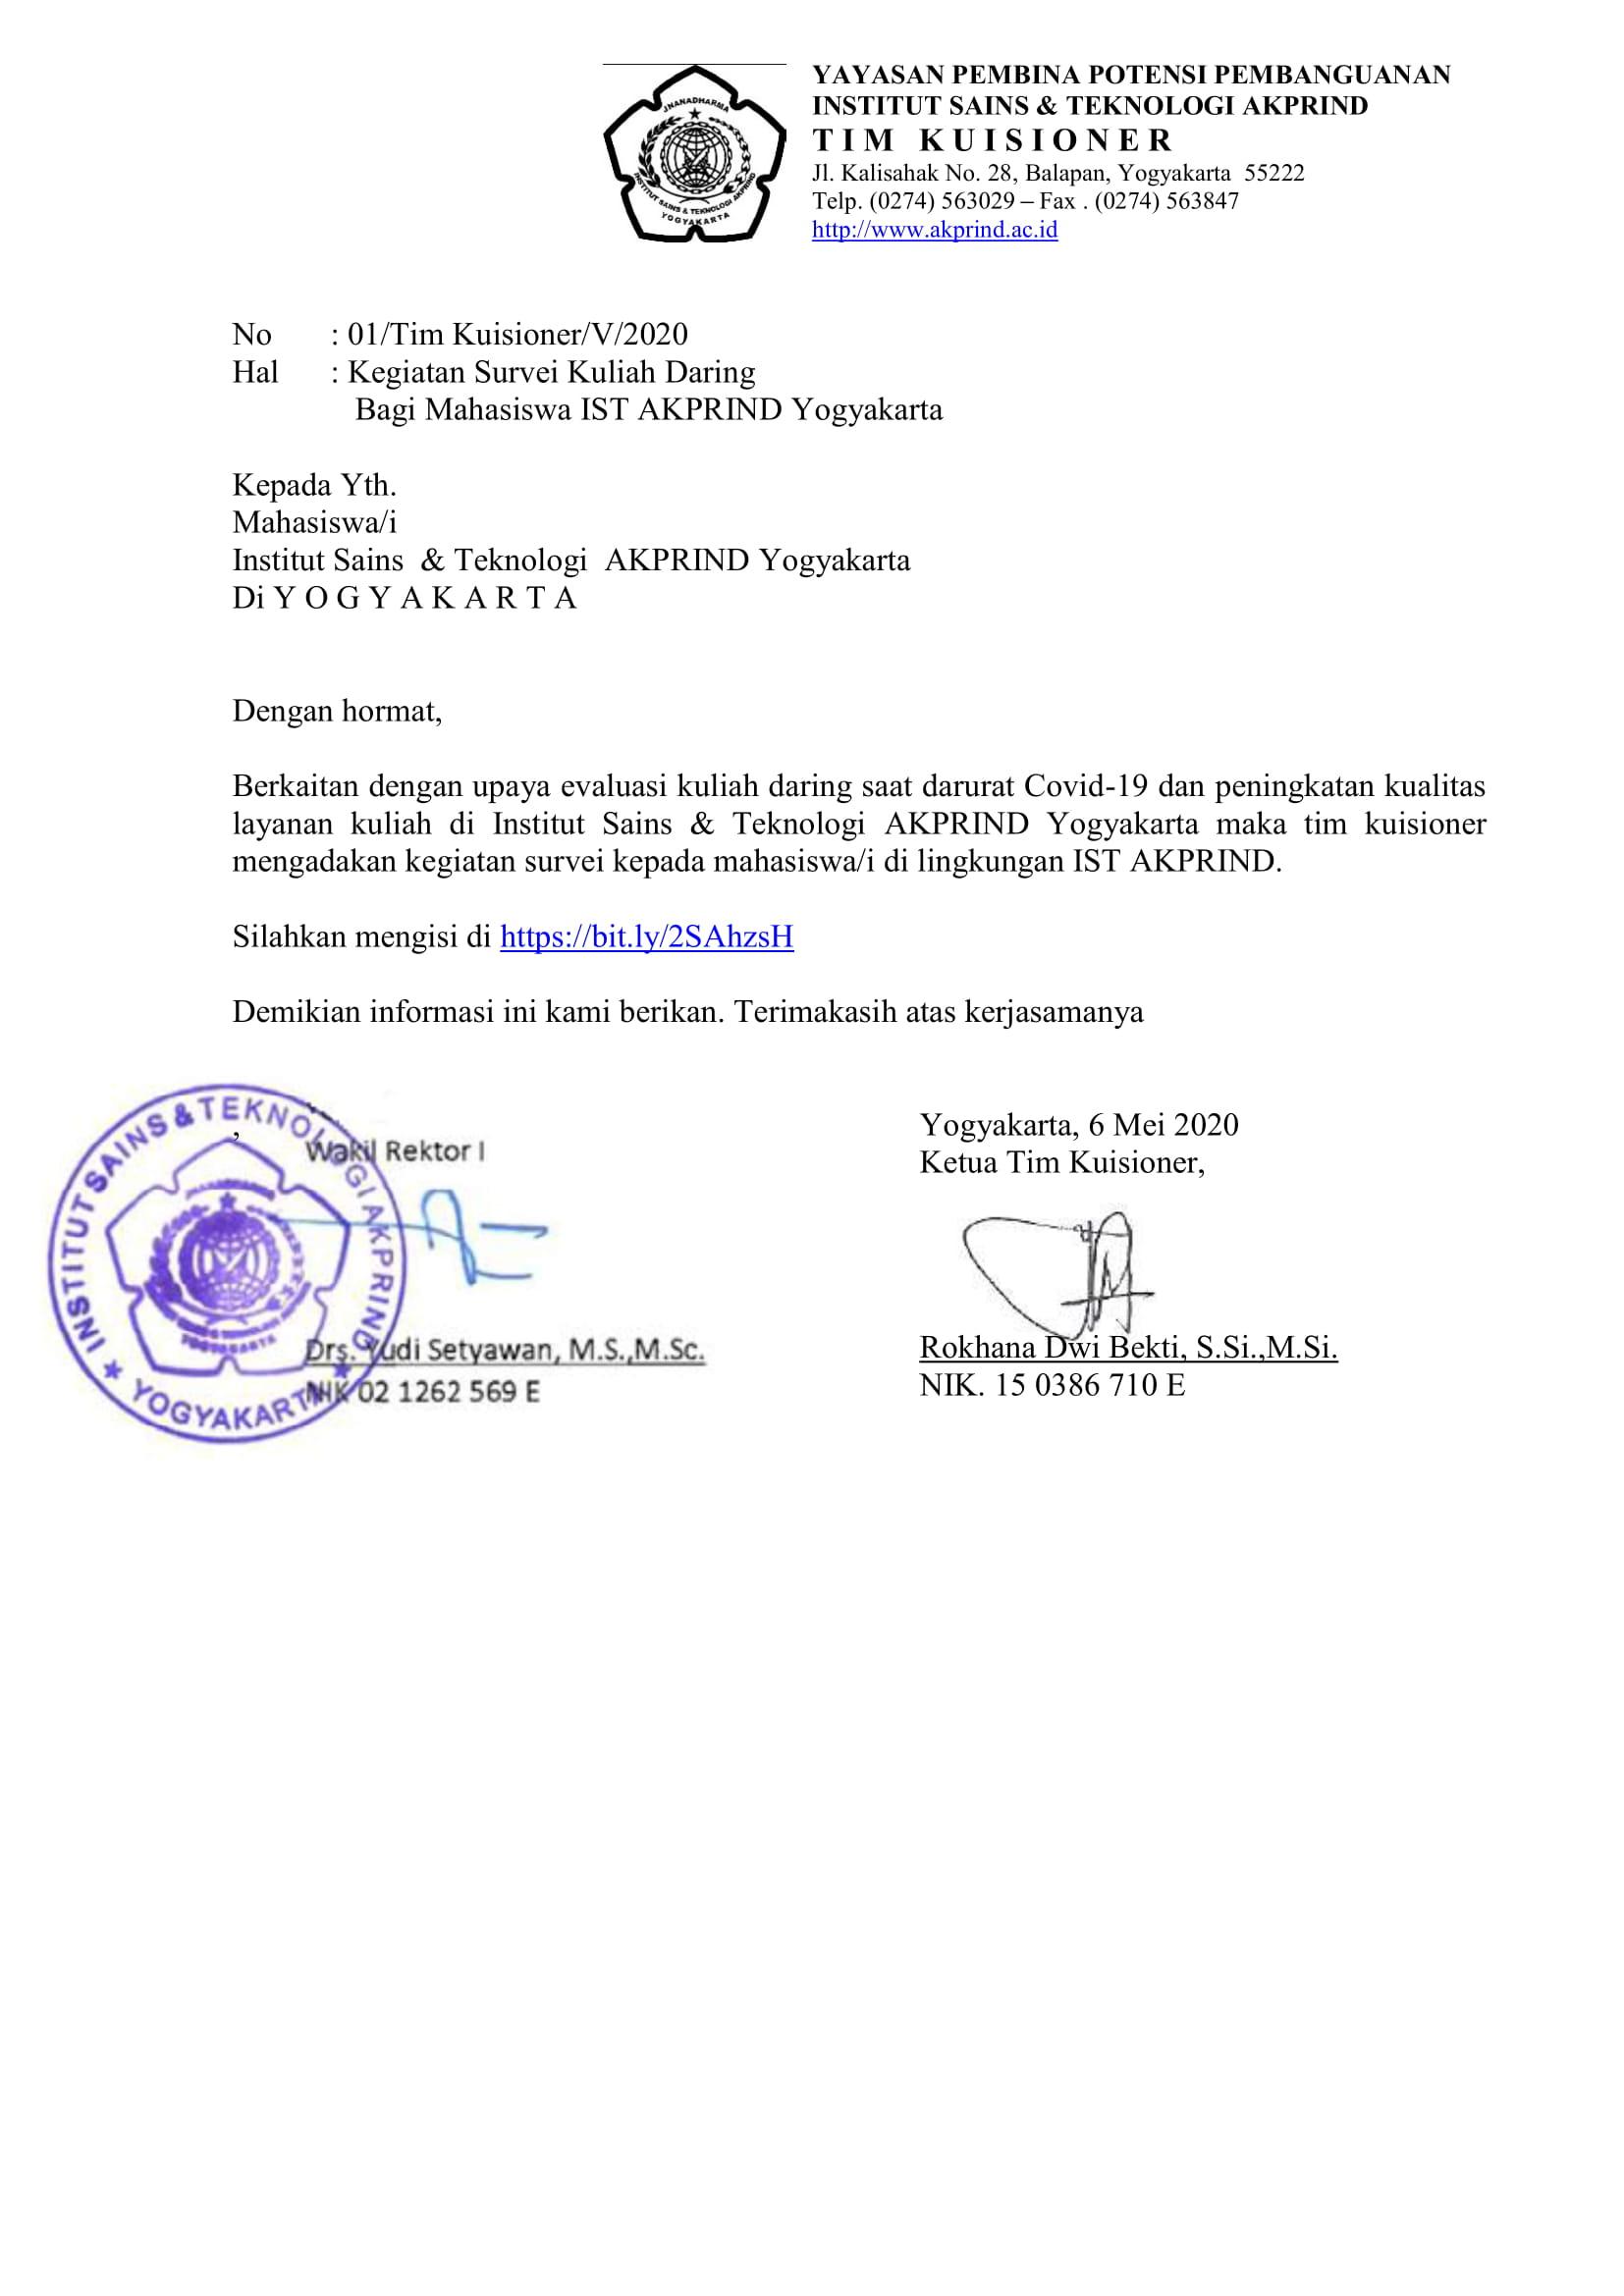 surat kuisioner kuliah daring covid-19 - Mahasiswa-1